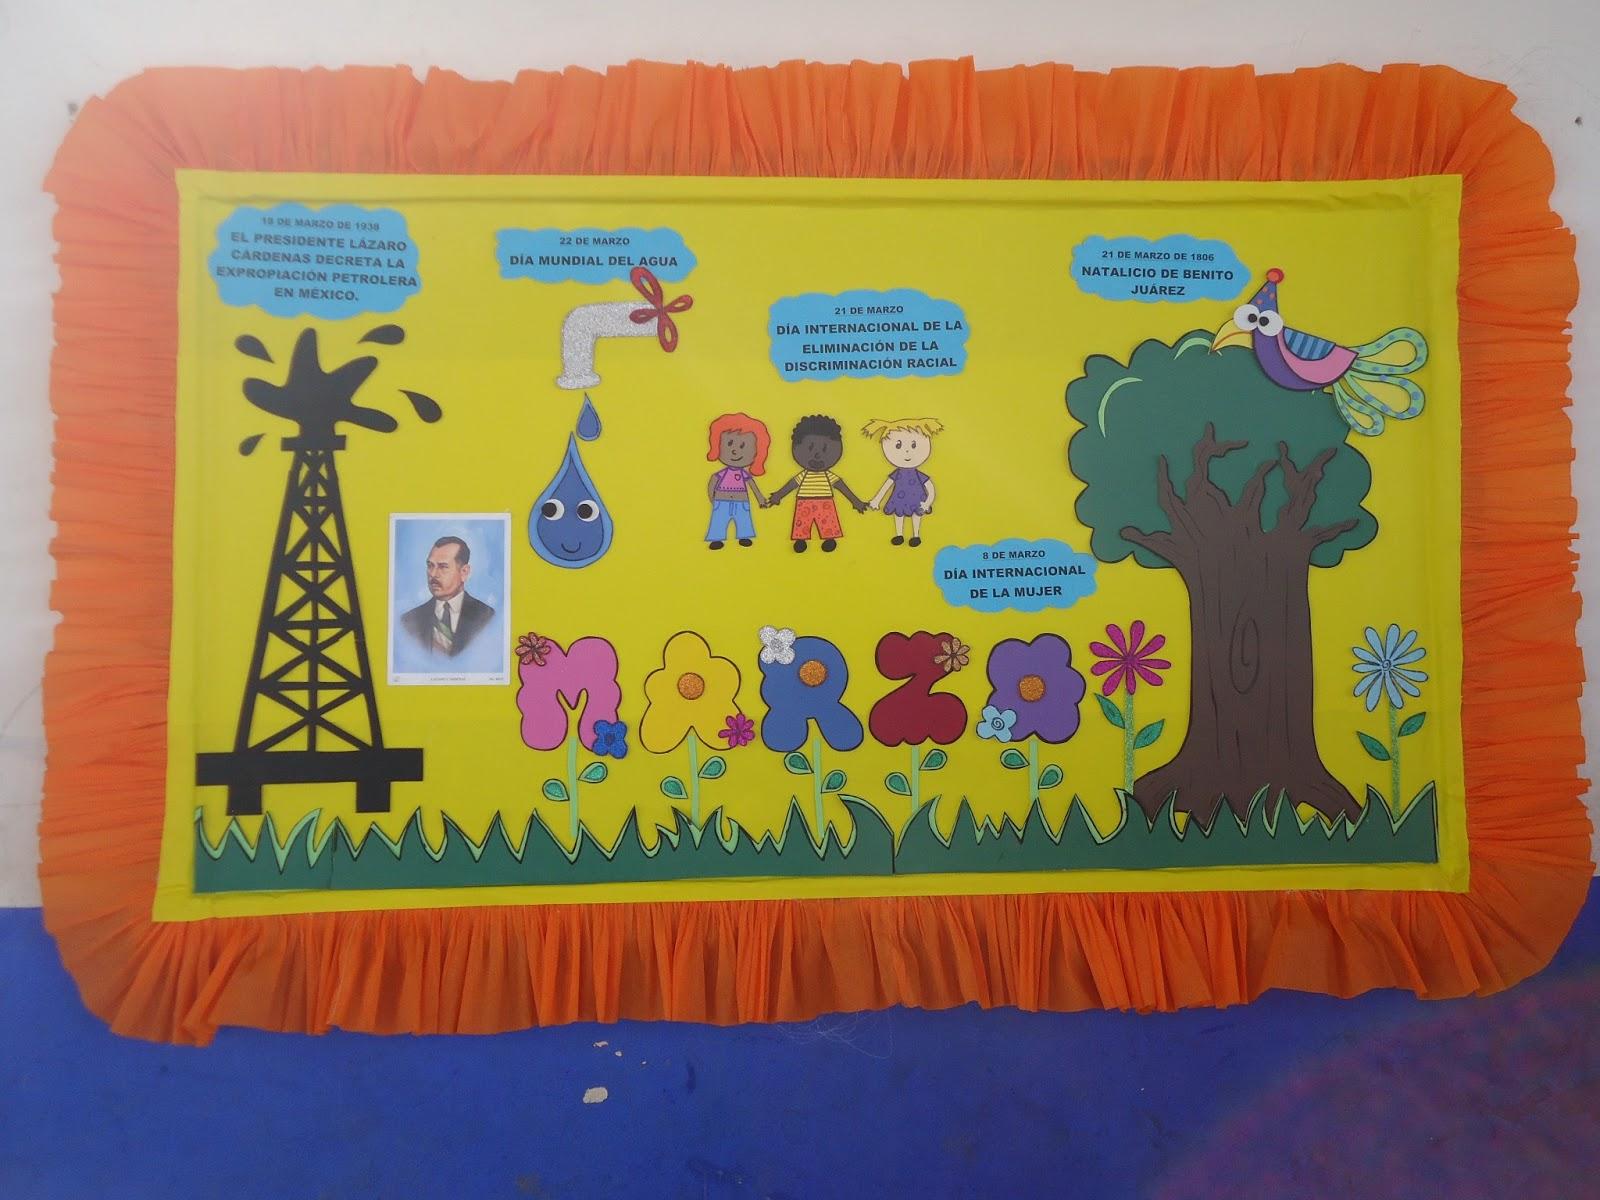 Periodico mural 18 imagenes educativas for El mural aviso de ocasion guadalajara